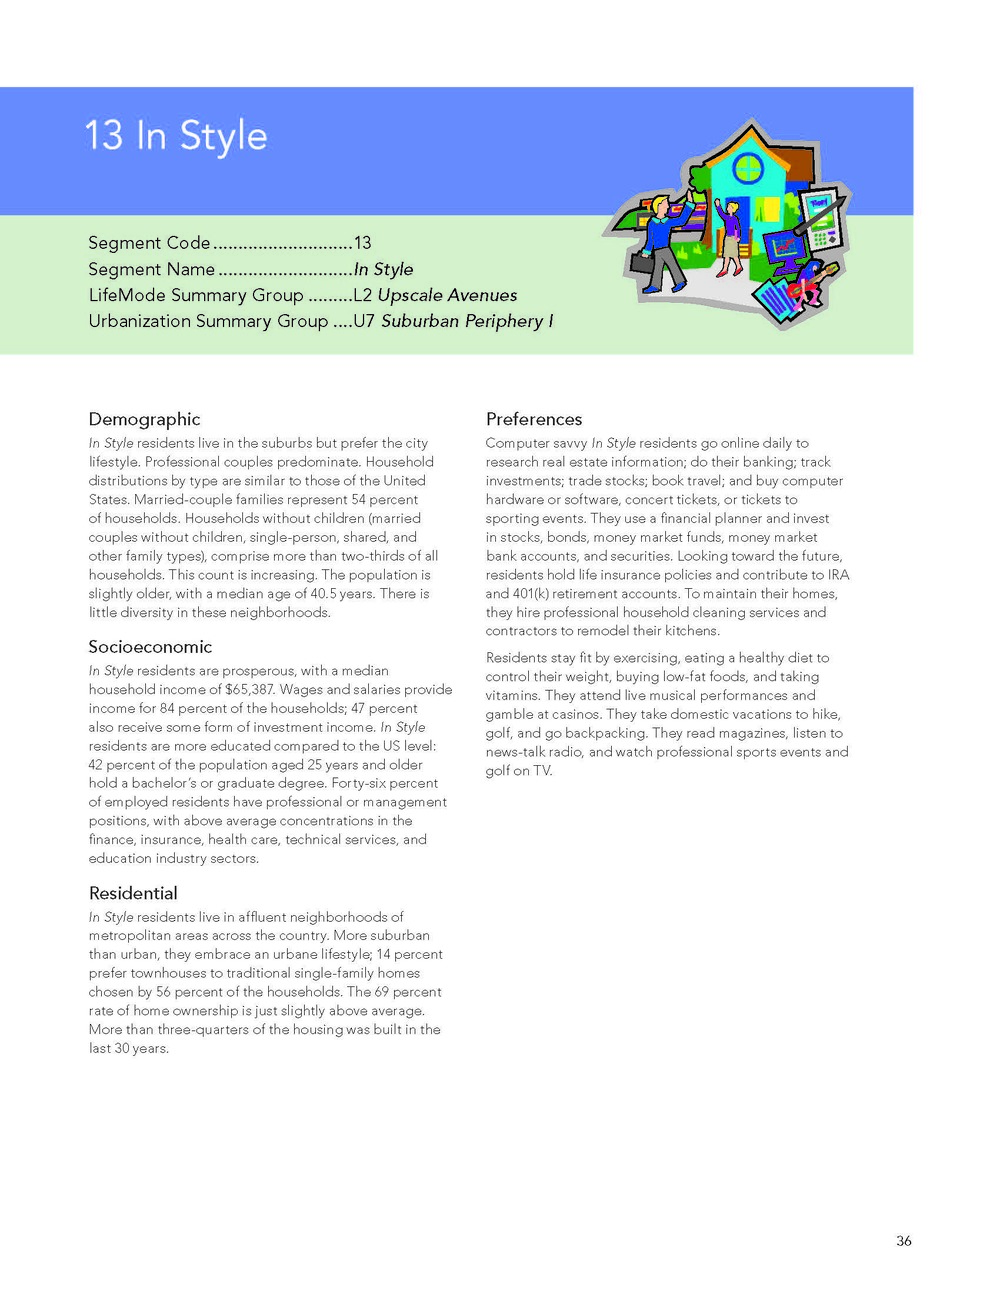 tapestry-segmentation_Page_39.jpg